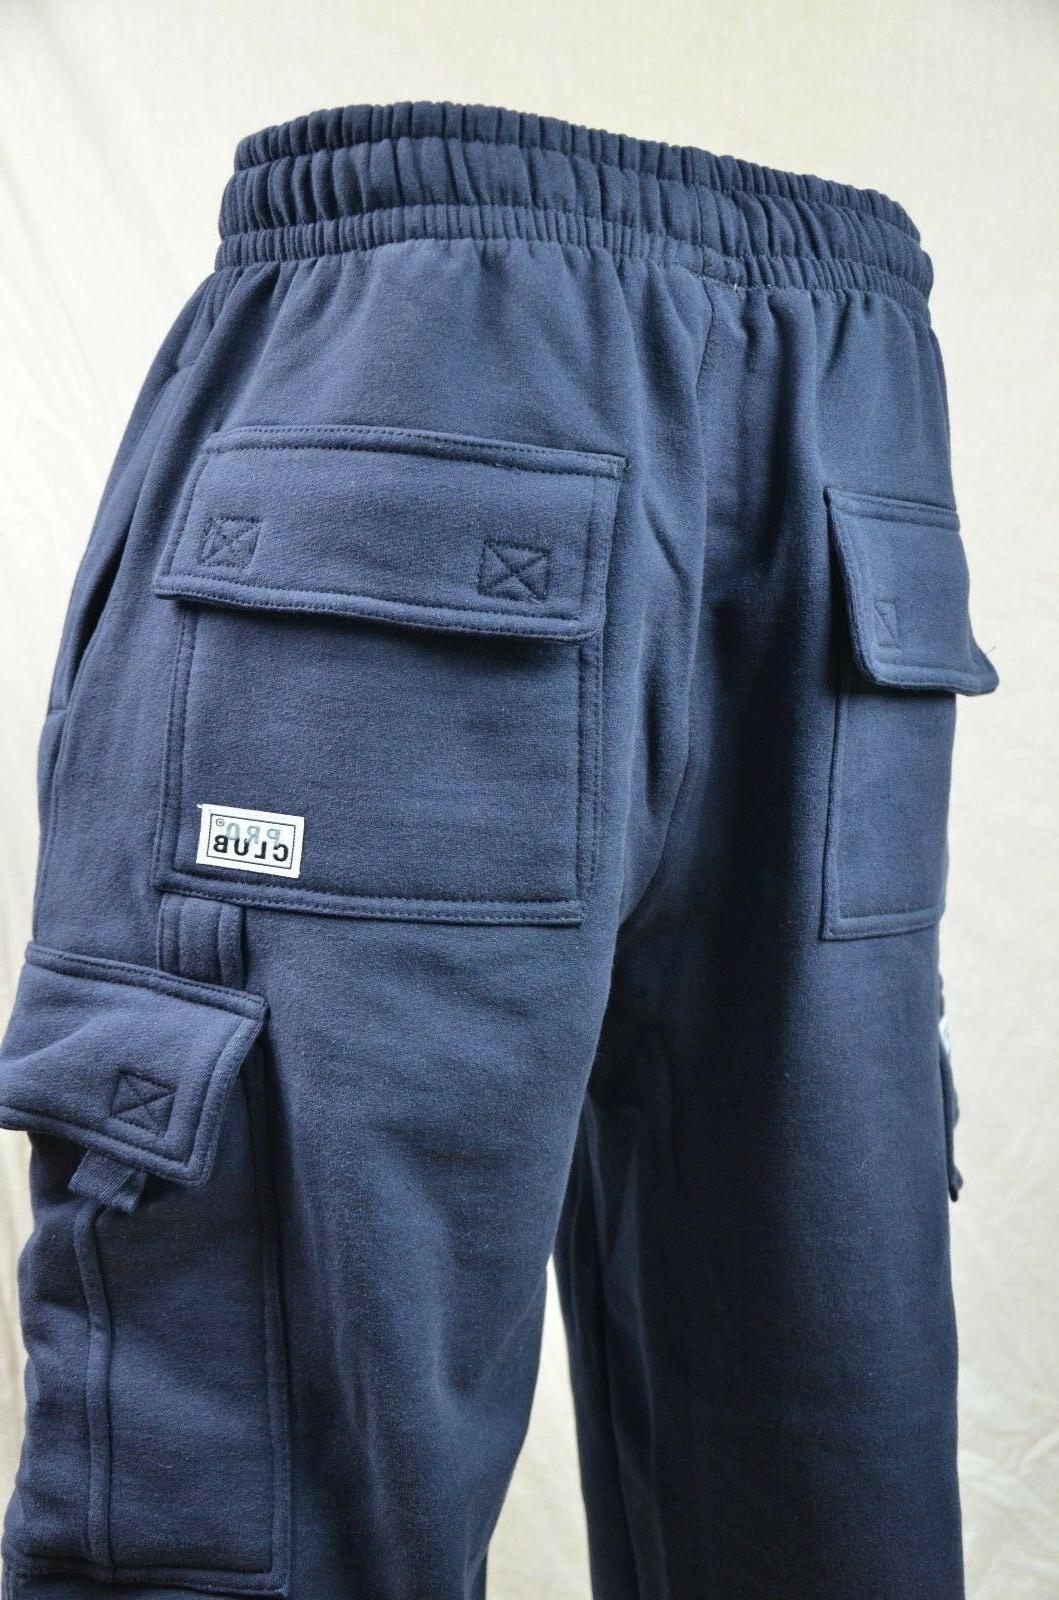 Pro Fleece Cargo Sweatpants Navy Blue